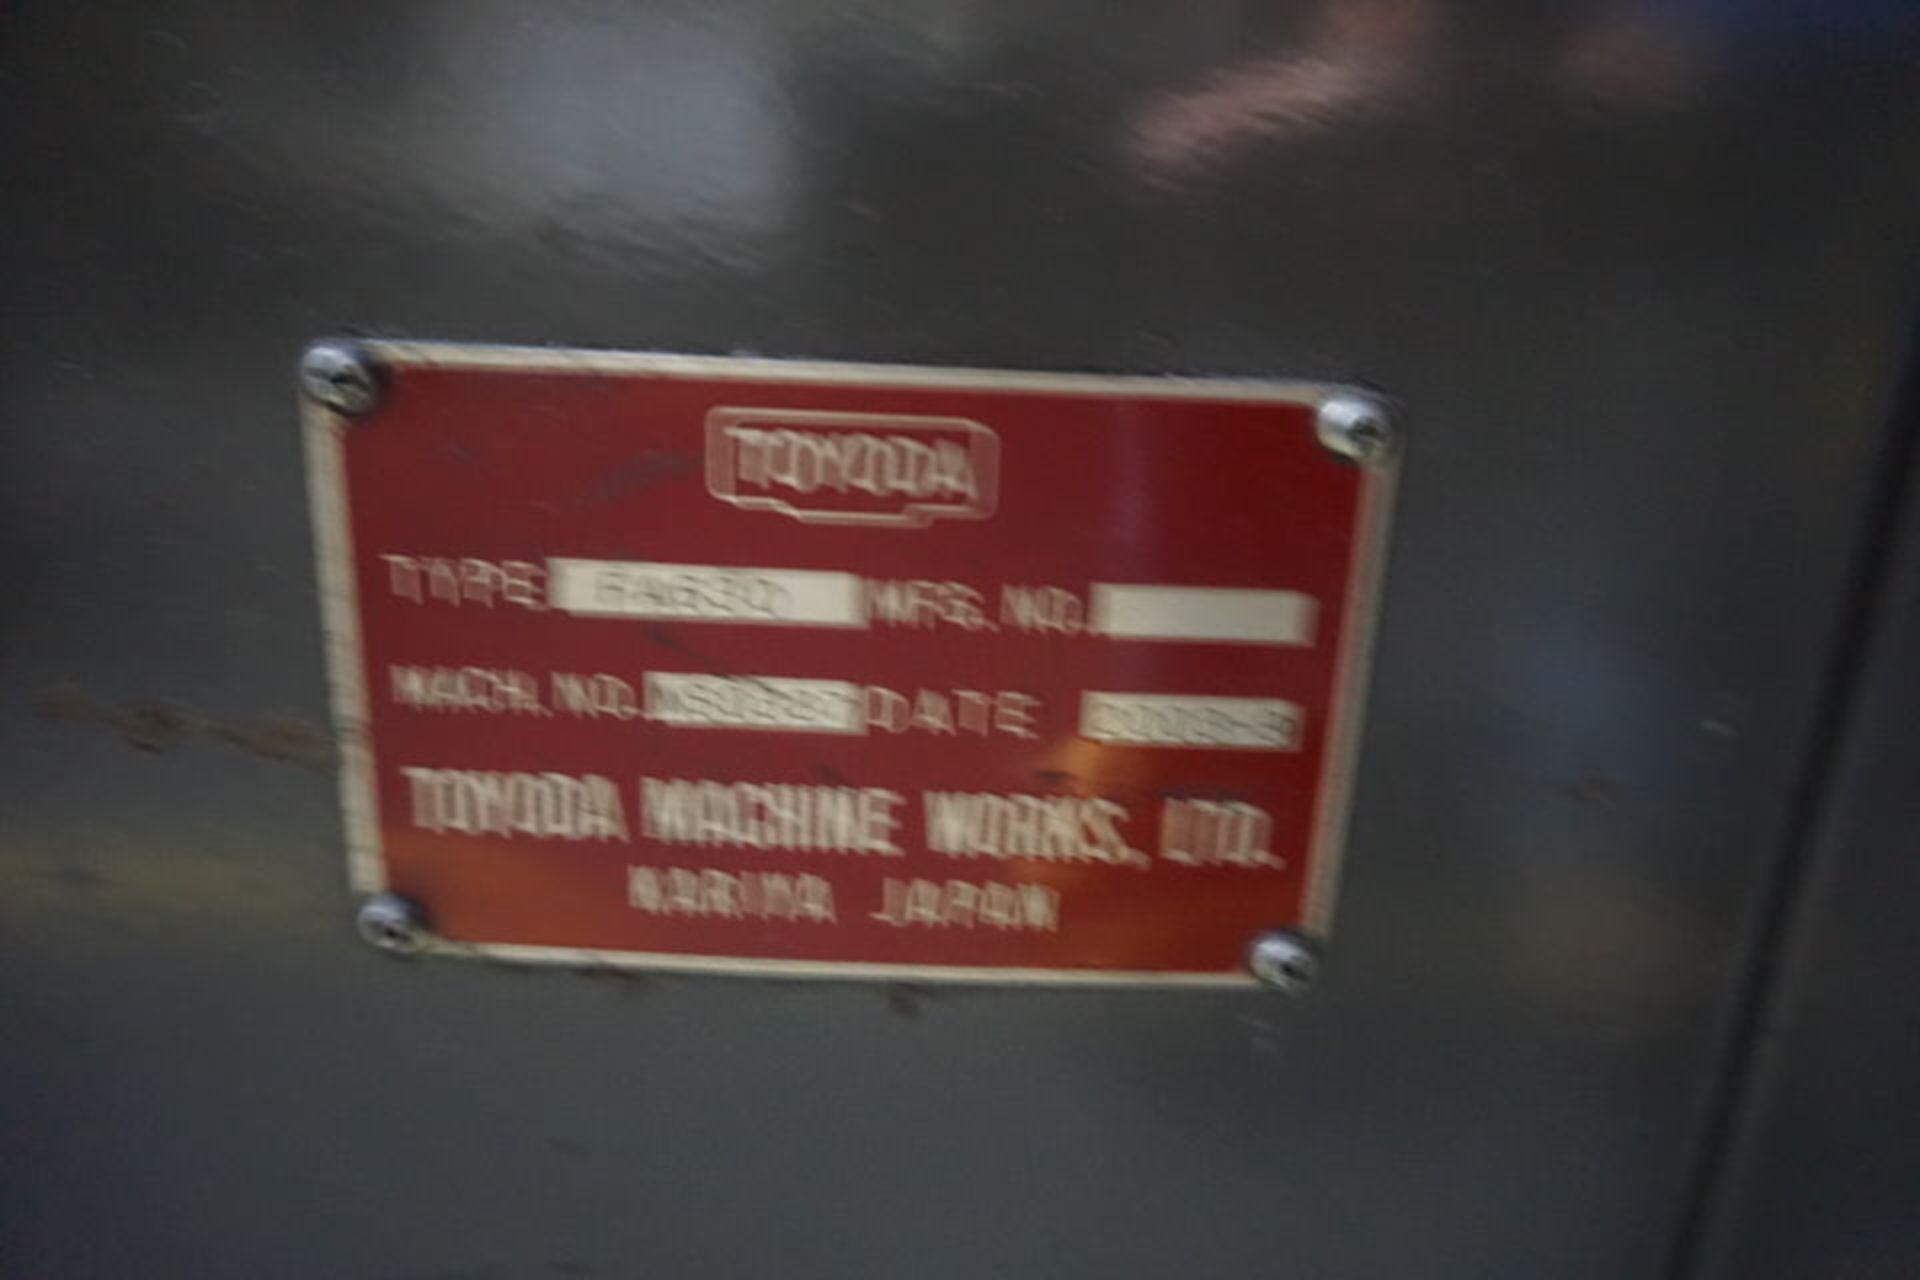 TOYODA FA630 HORIZONTAL MACHINING CENTER, DOM: 2003 (ASST#:P0150204) - Image 4 of 5